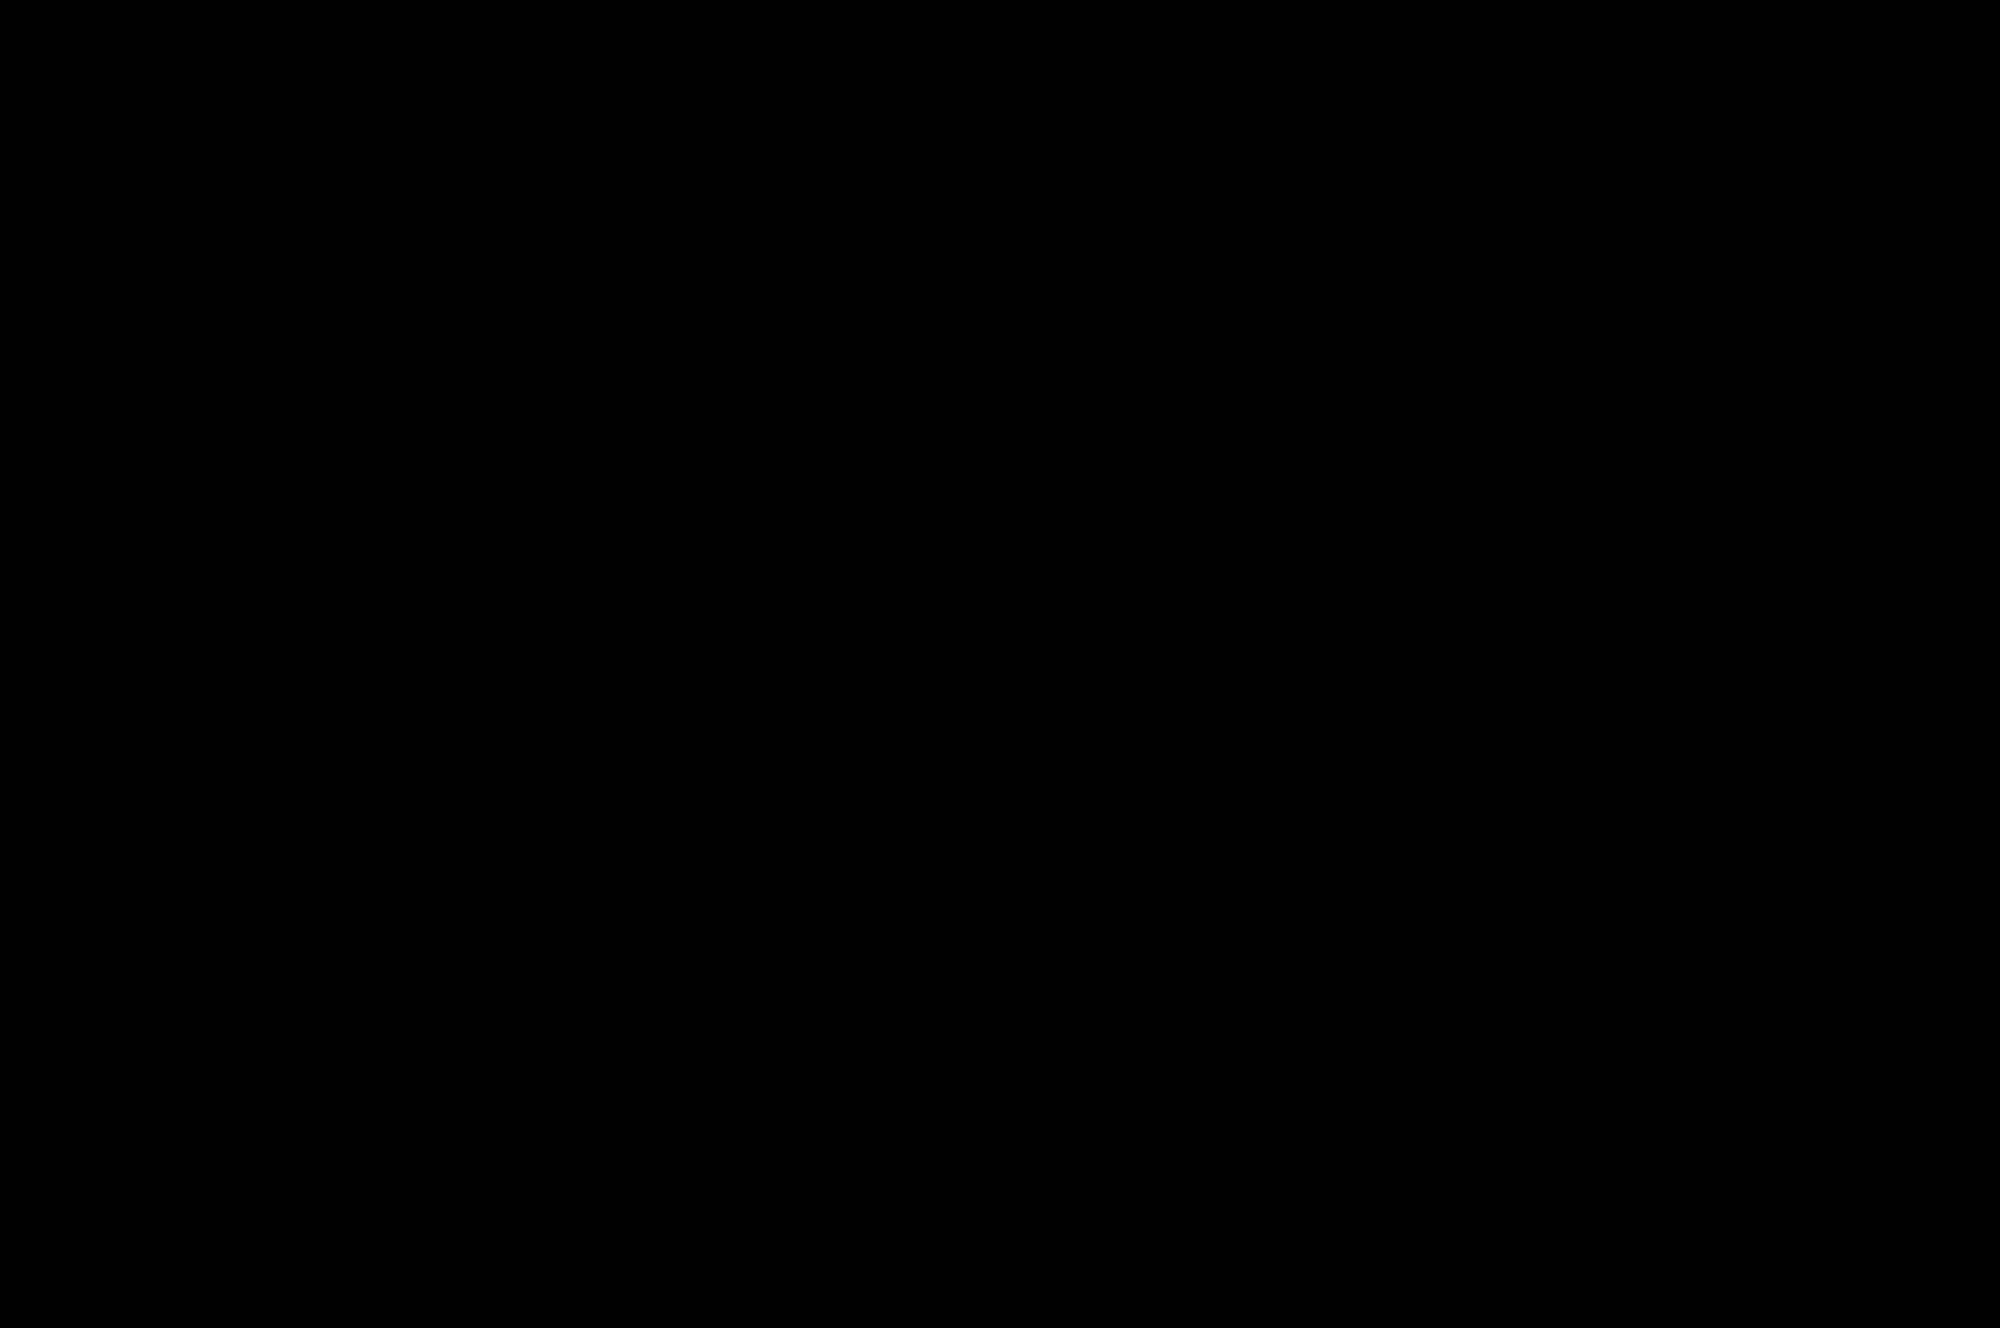 2000x1328 Fileduck Sotka1.svg